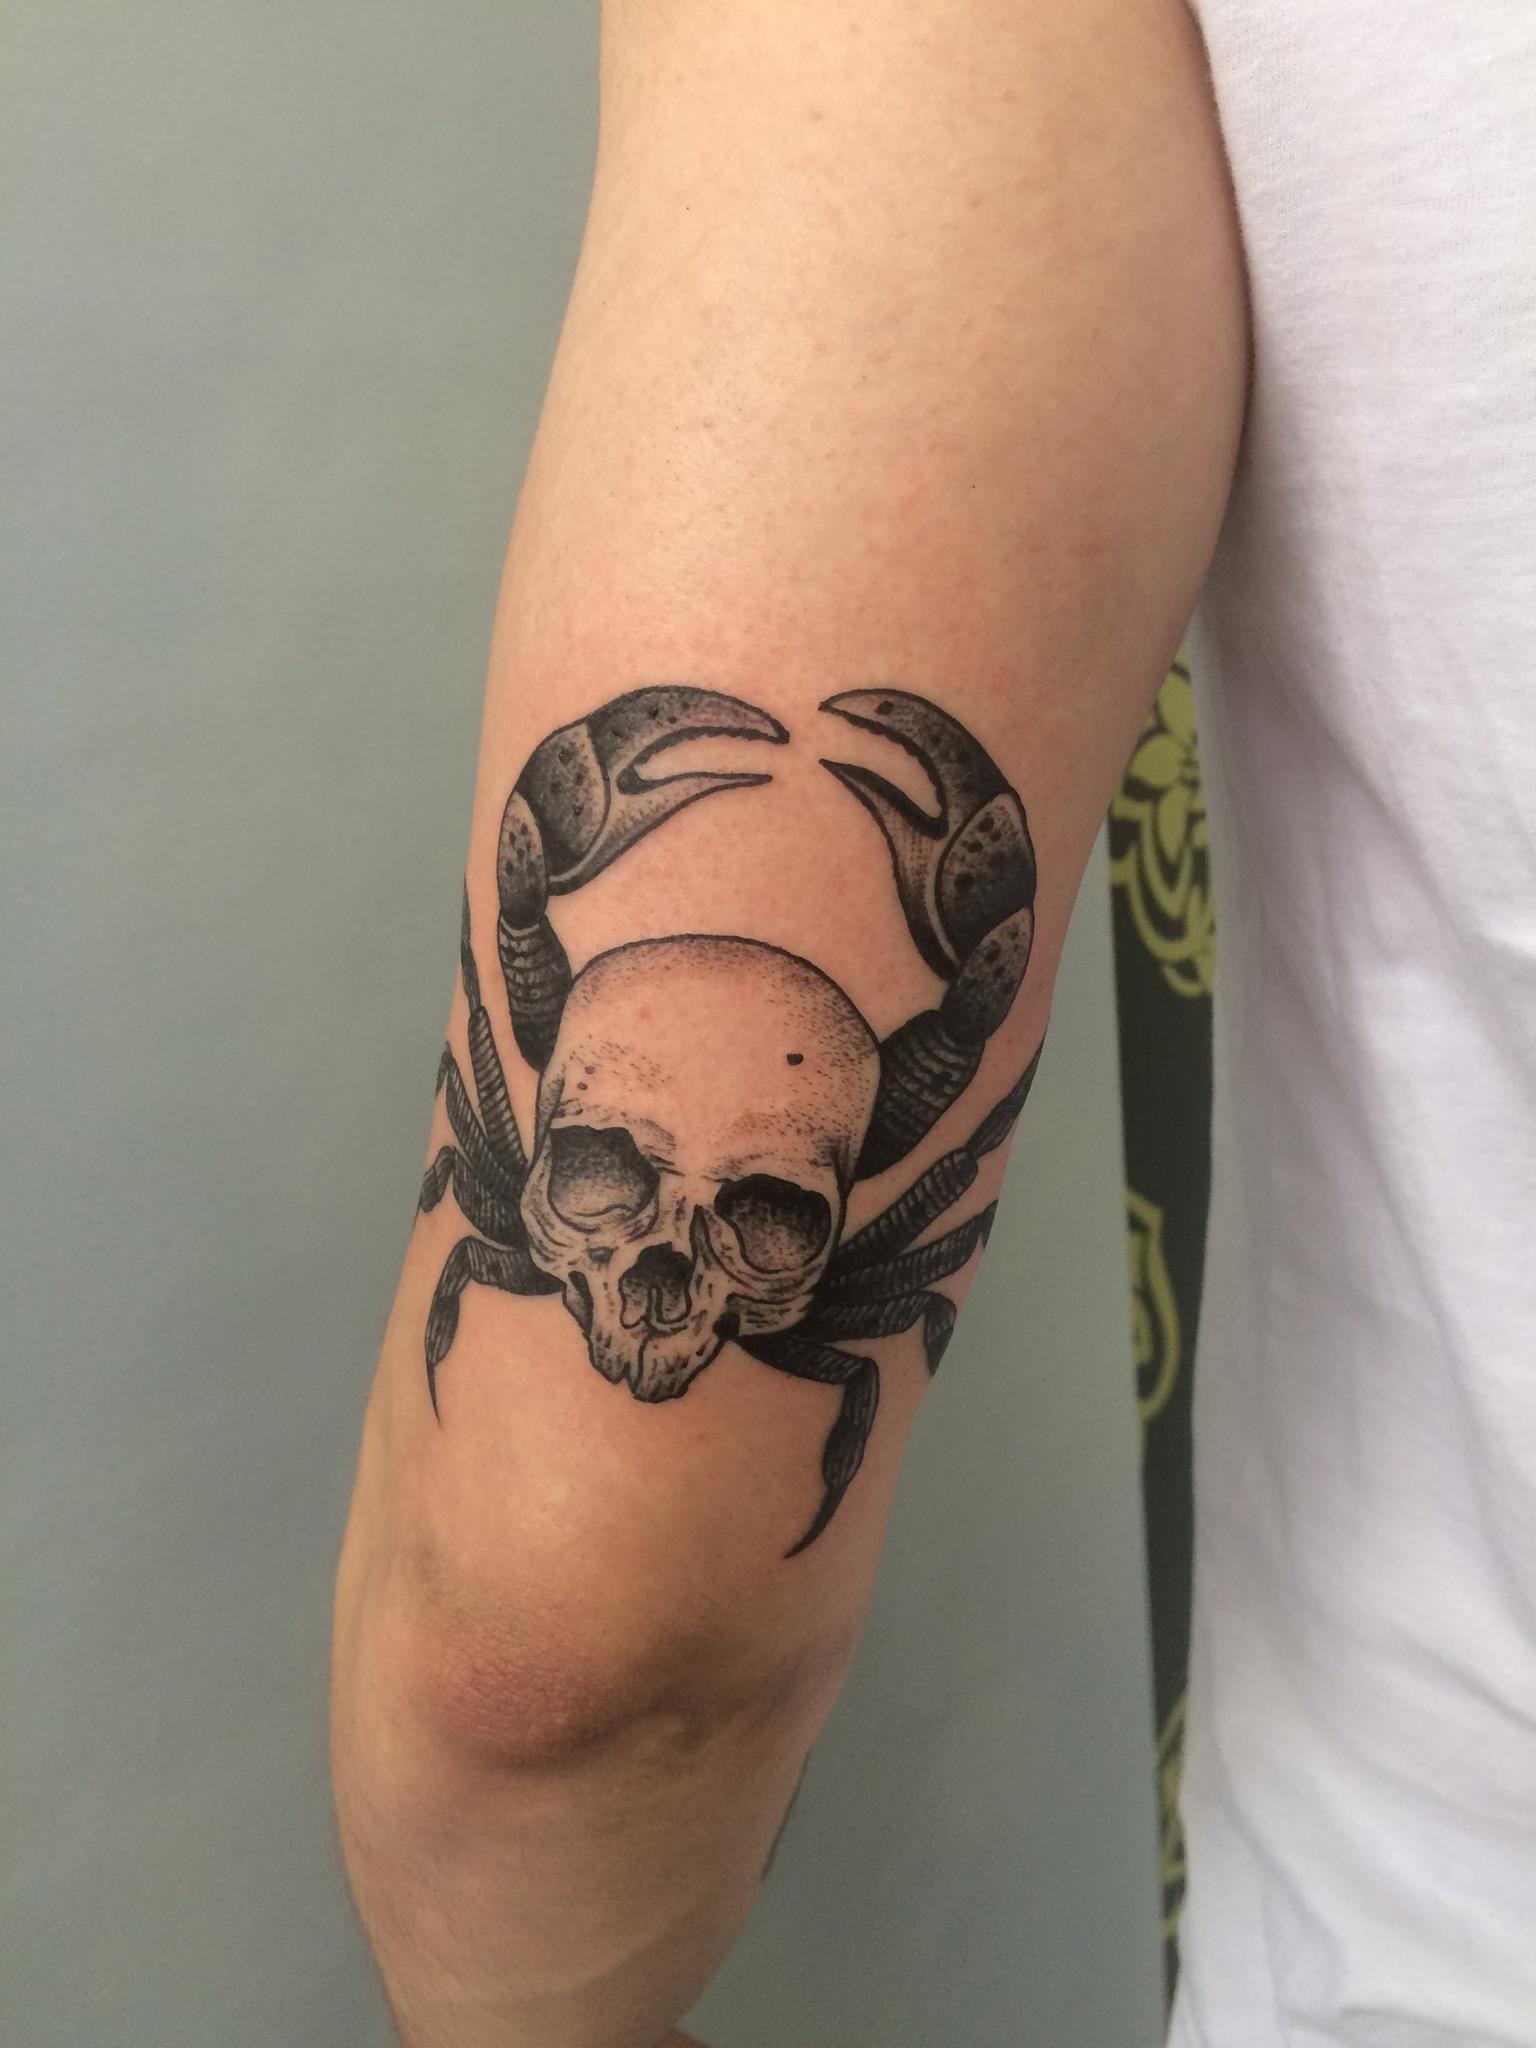 Skull Crab By Klaudia Holda 9th Circle Tattoo Krakow Poland